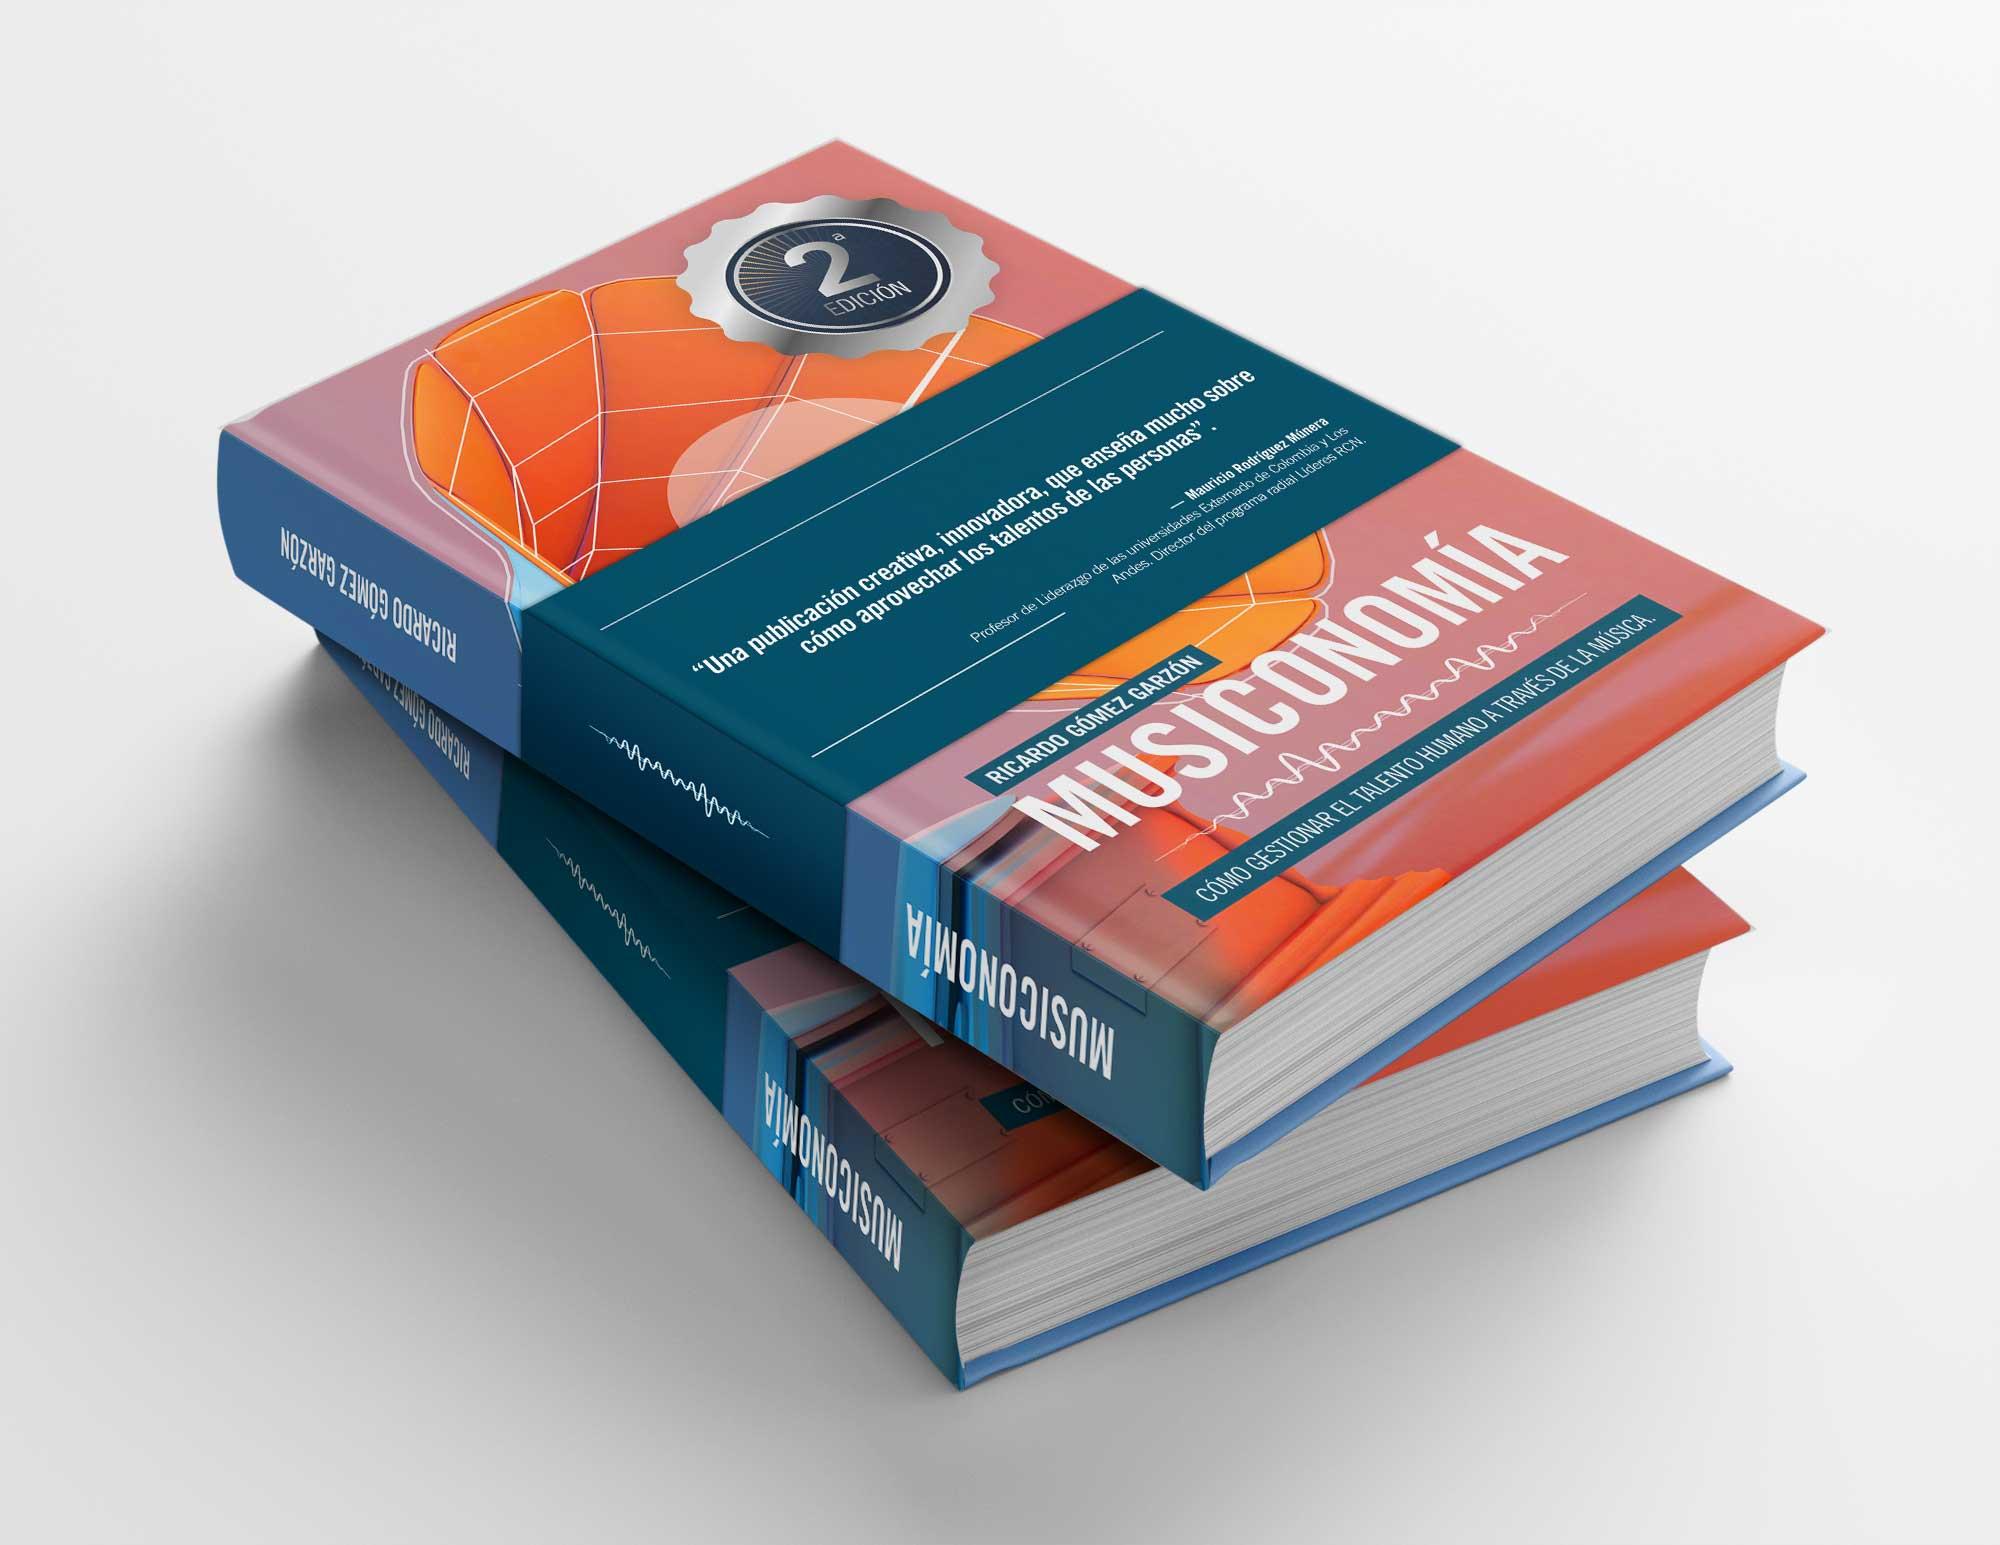 Musiconomia-edicion2-prologo.jpg